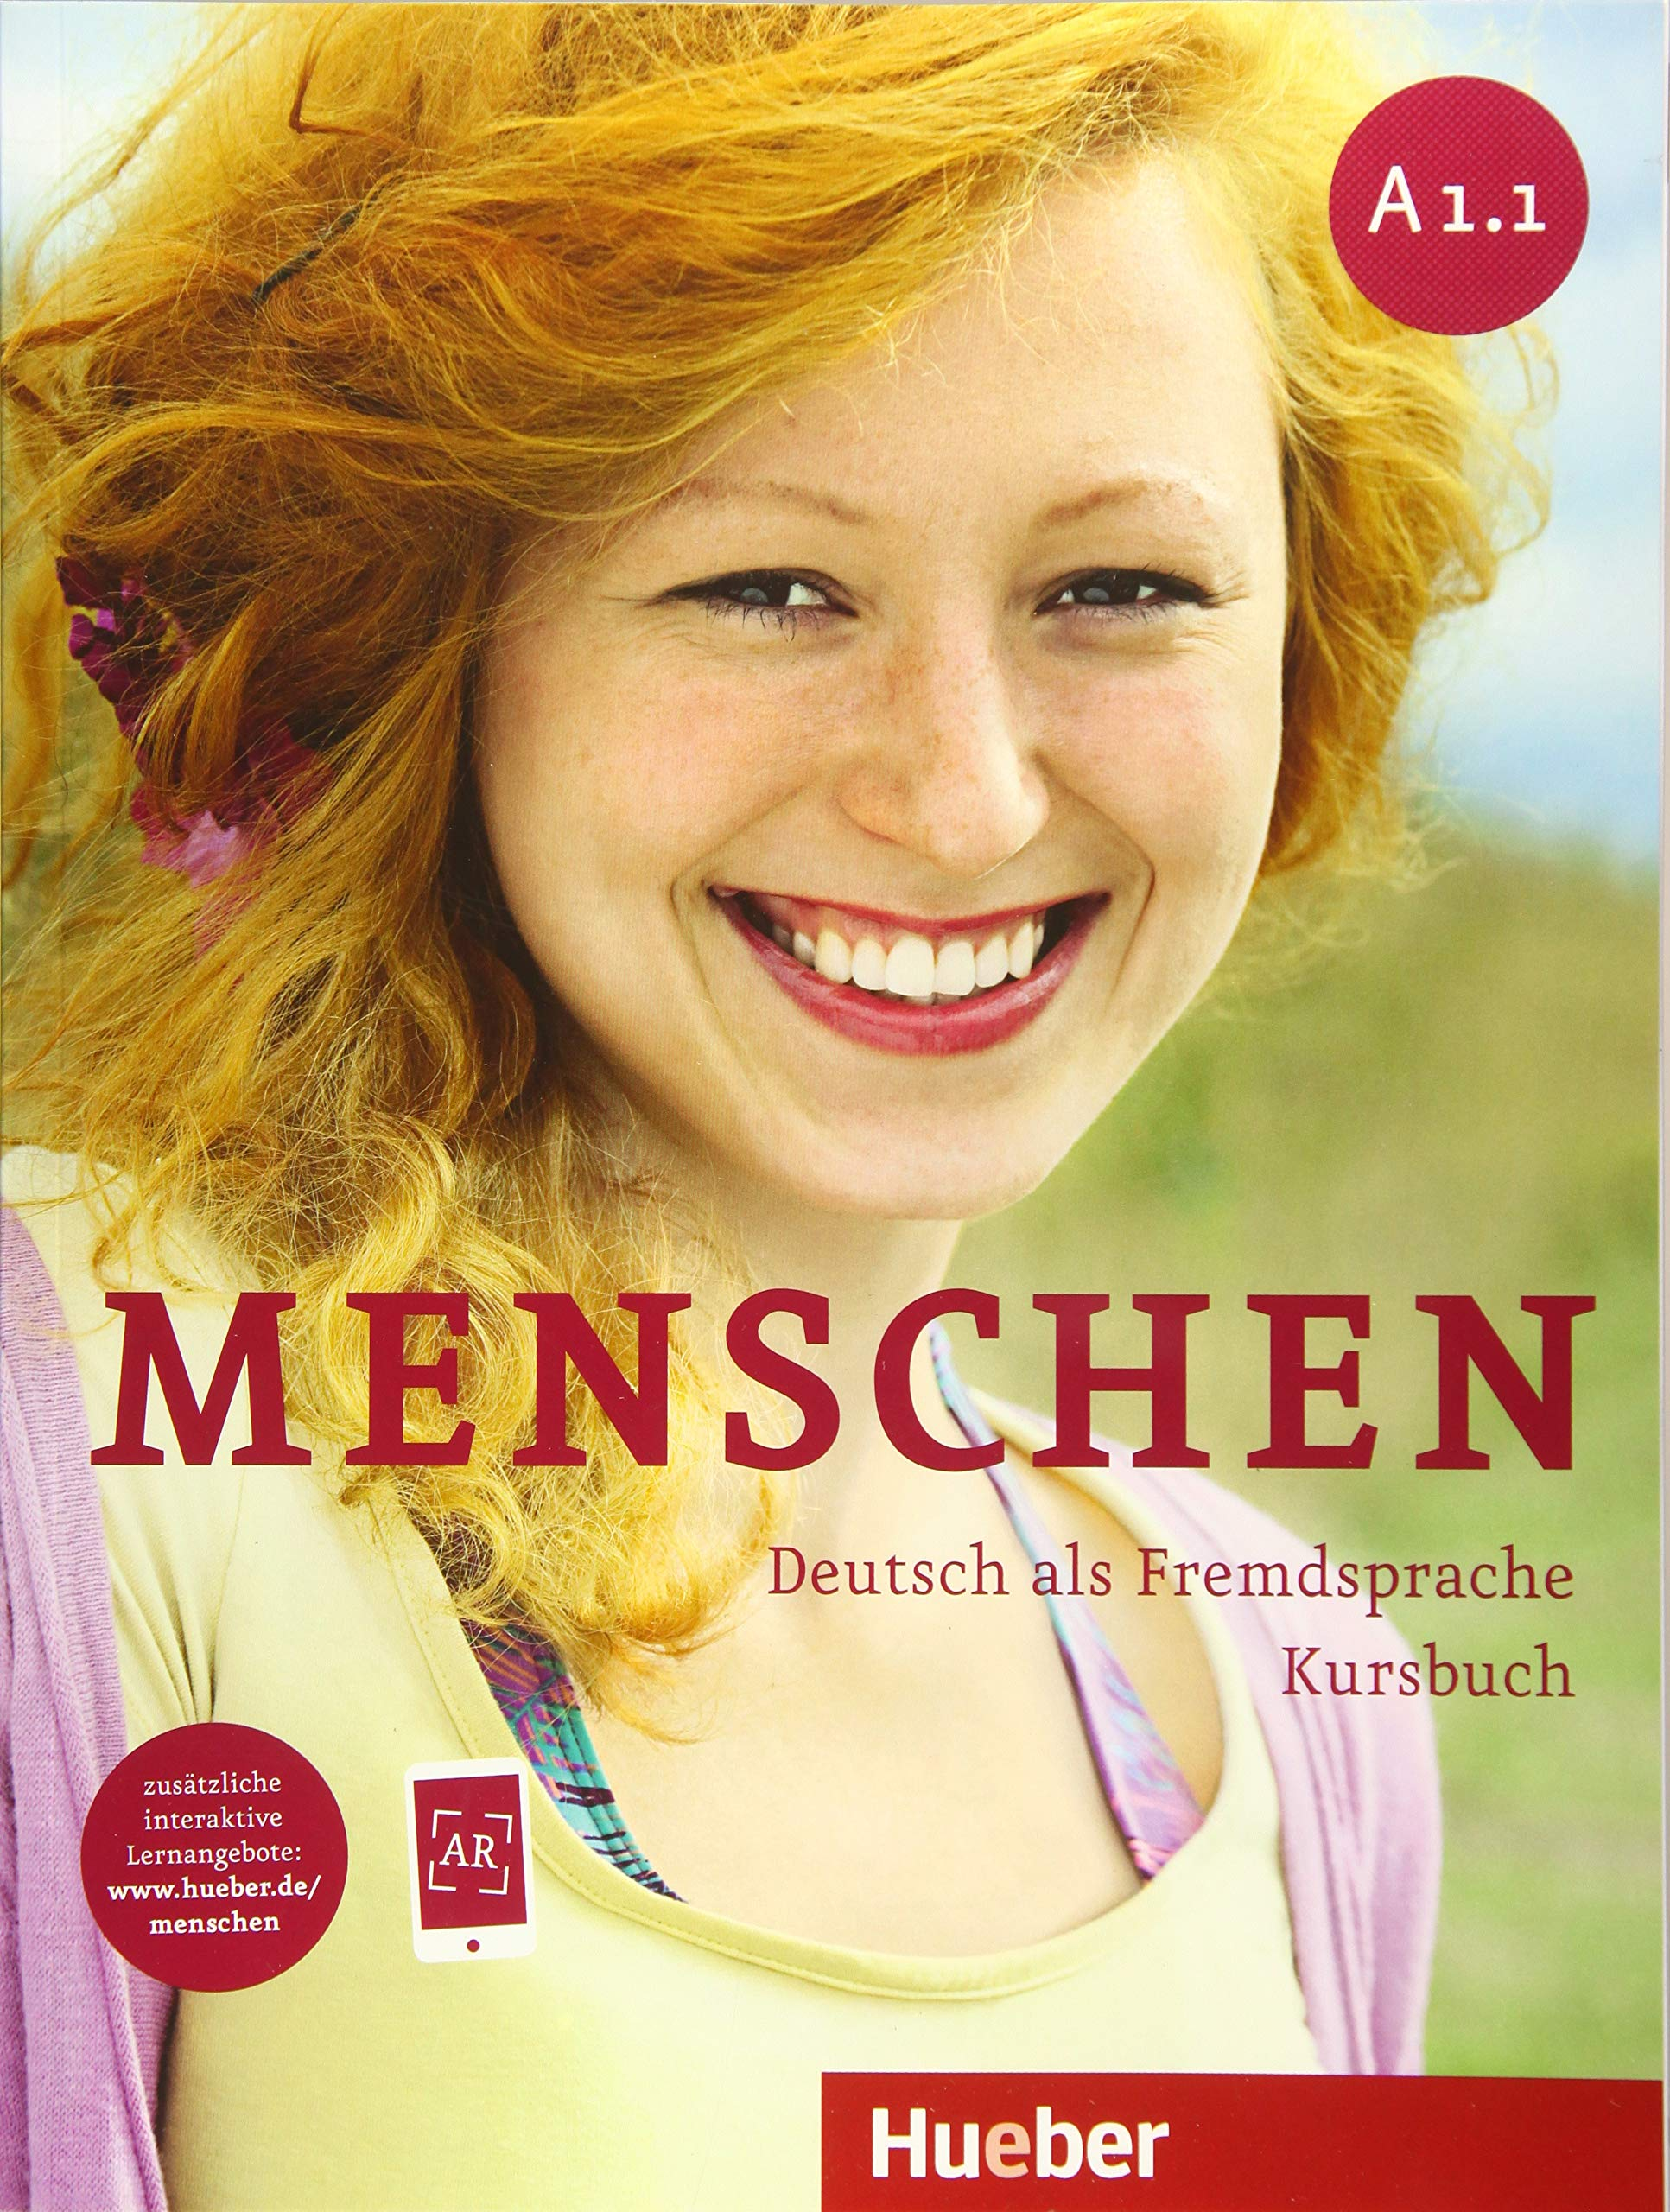 Menschen A1 1 Kursb Ar L Alum German Edition Evans Sandra Pude Angela Specht Franz 9783193619013 Amazon Com Books